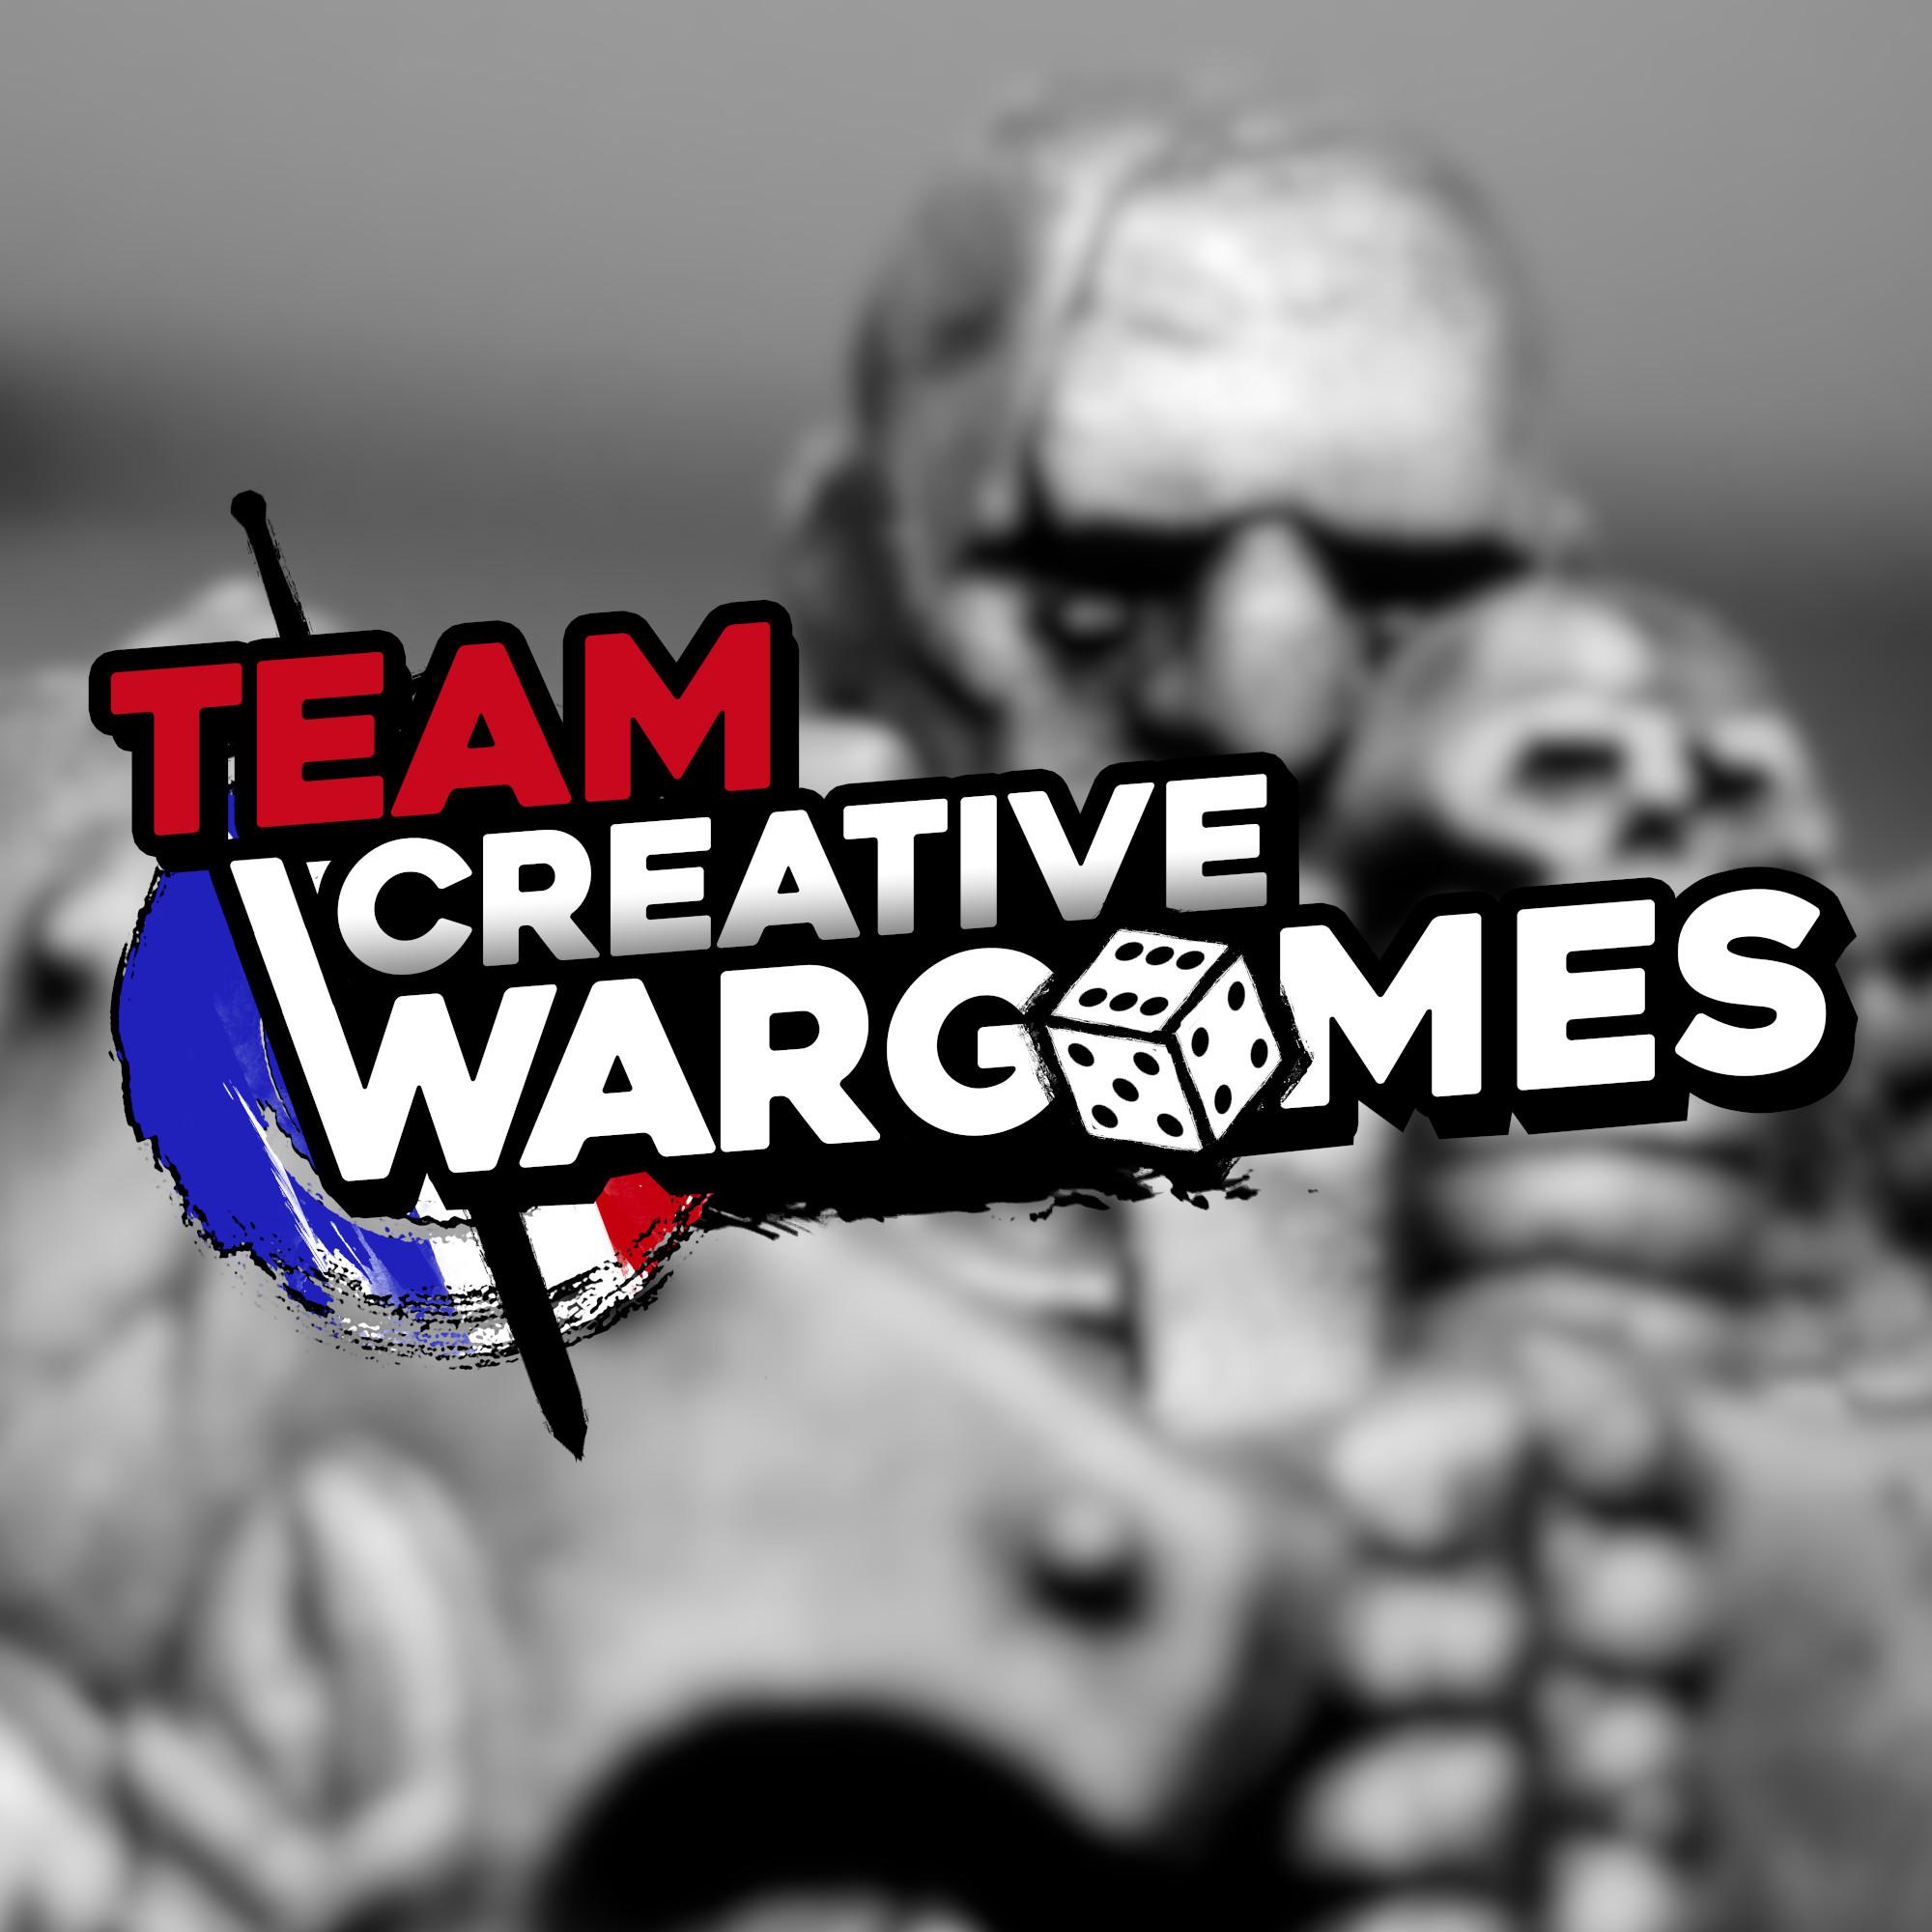 Creative Wargames